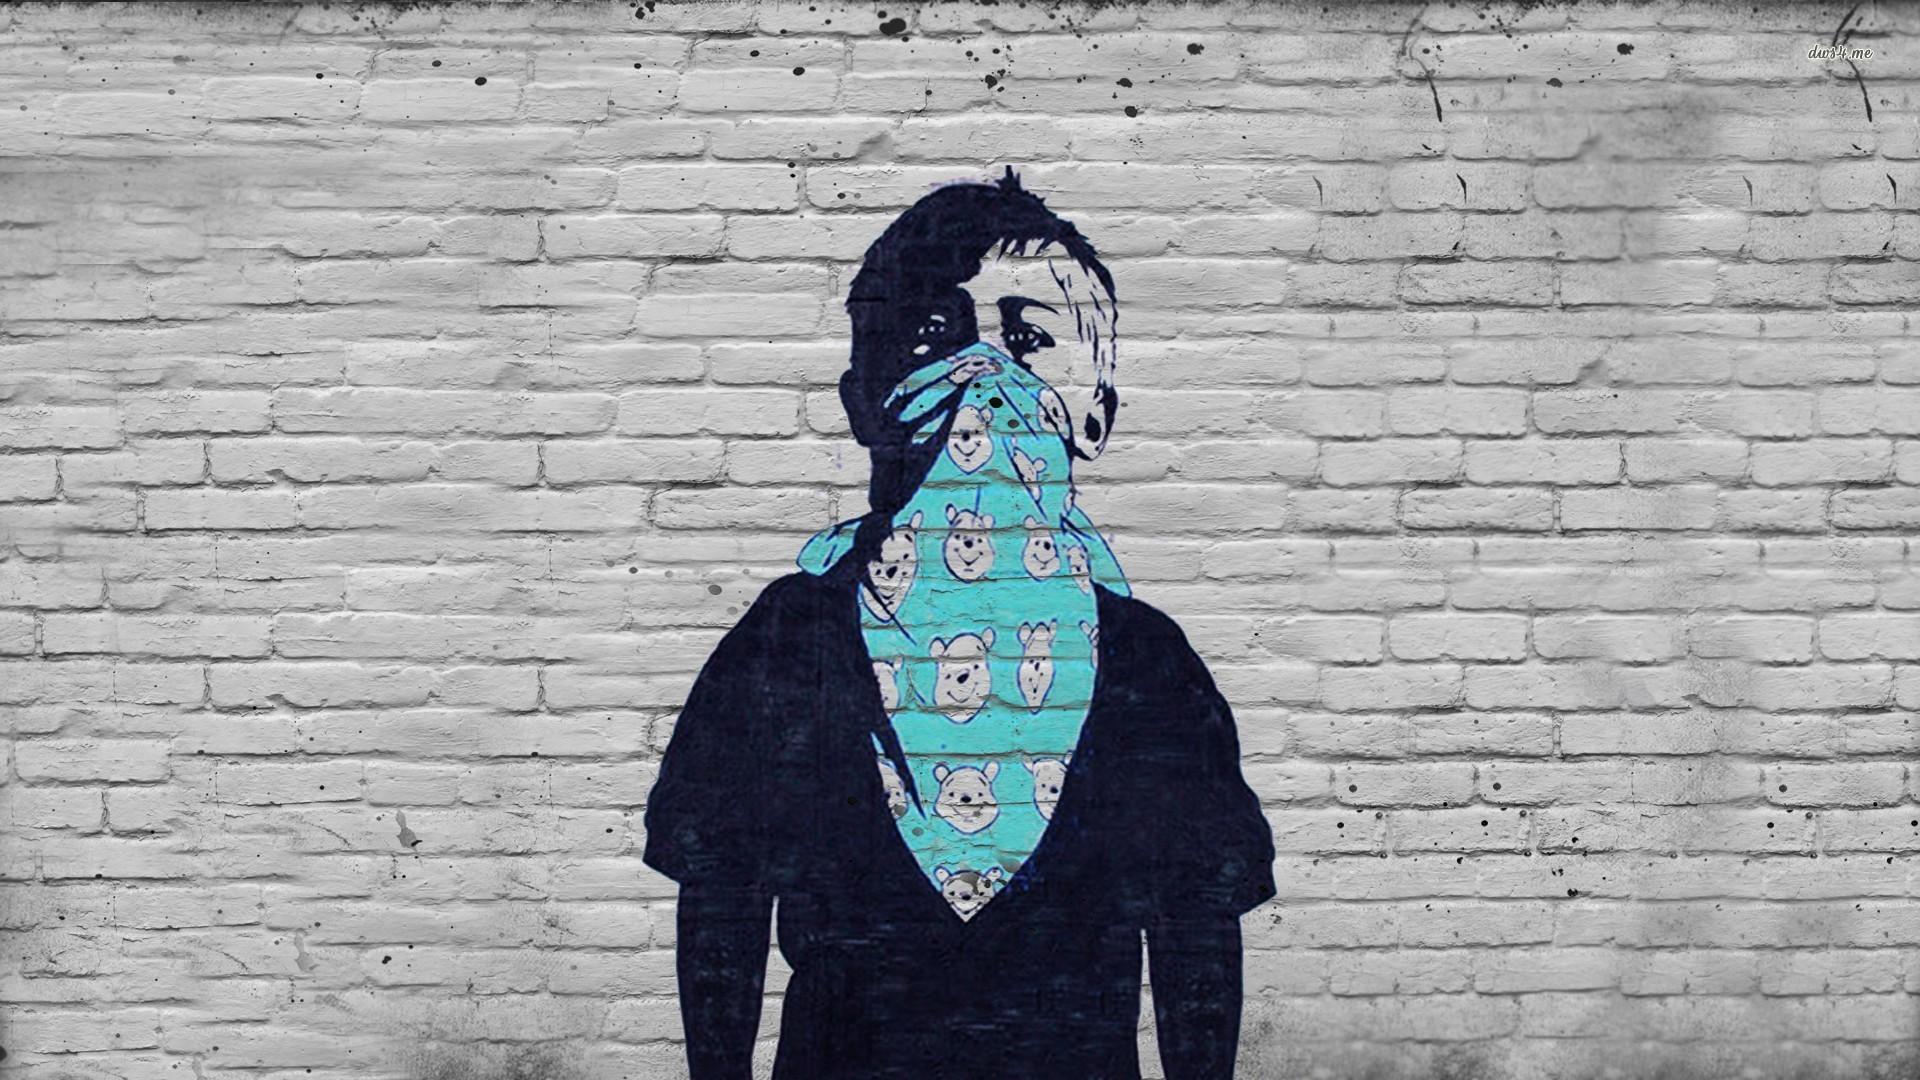 17674-graffiti-of-an-anarchist-boy-1920×1080-artistic-wallpaper